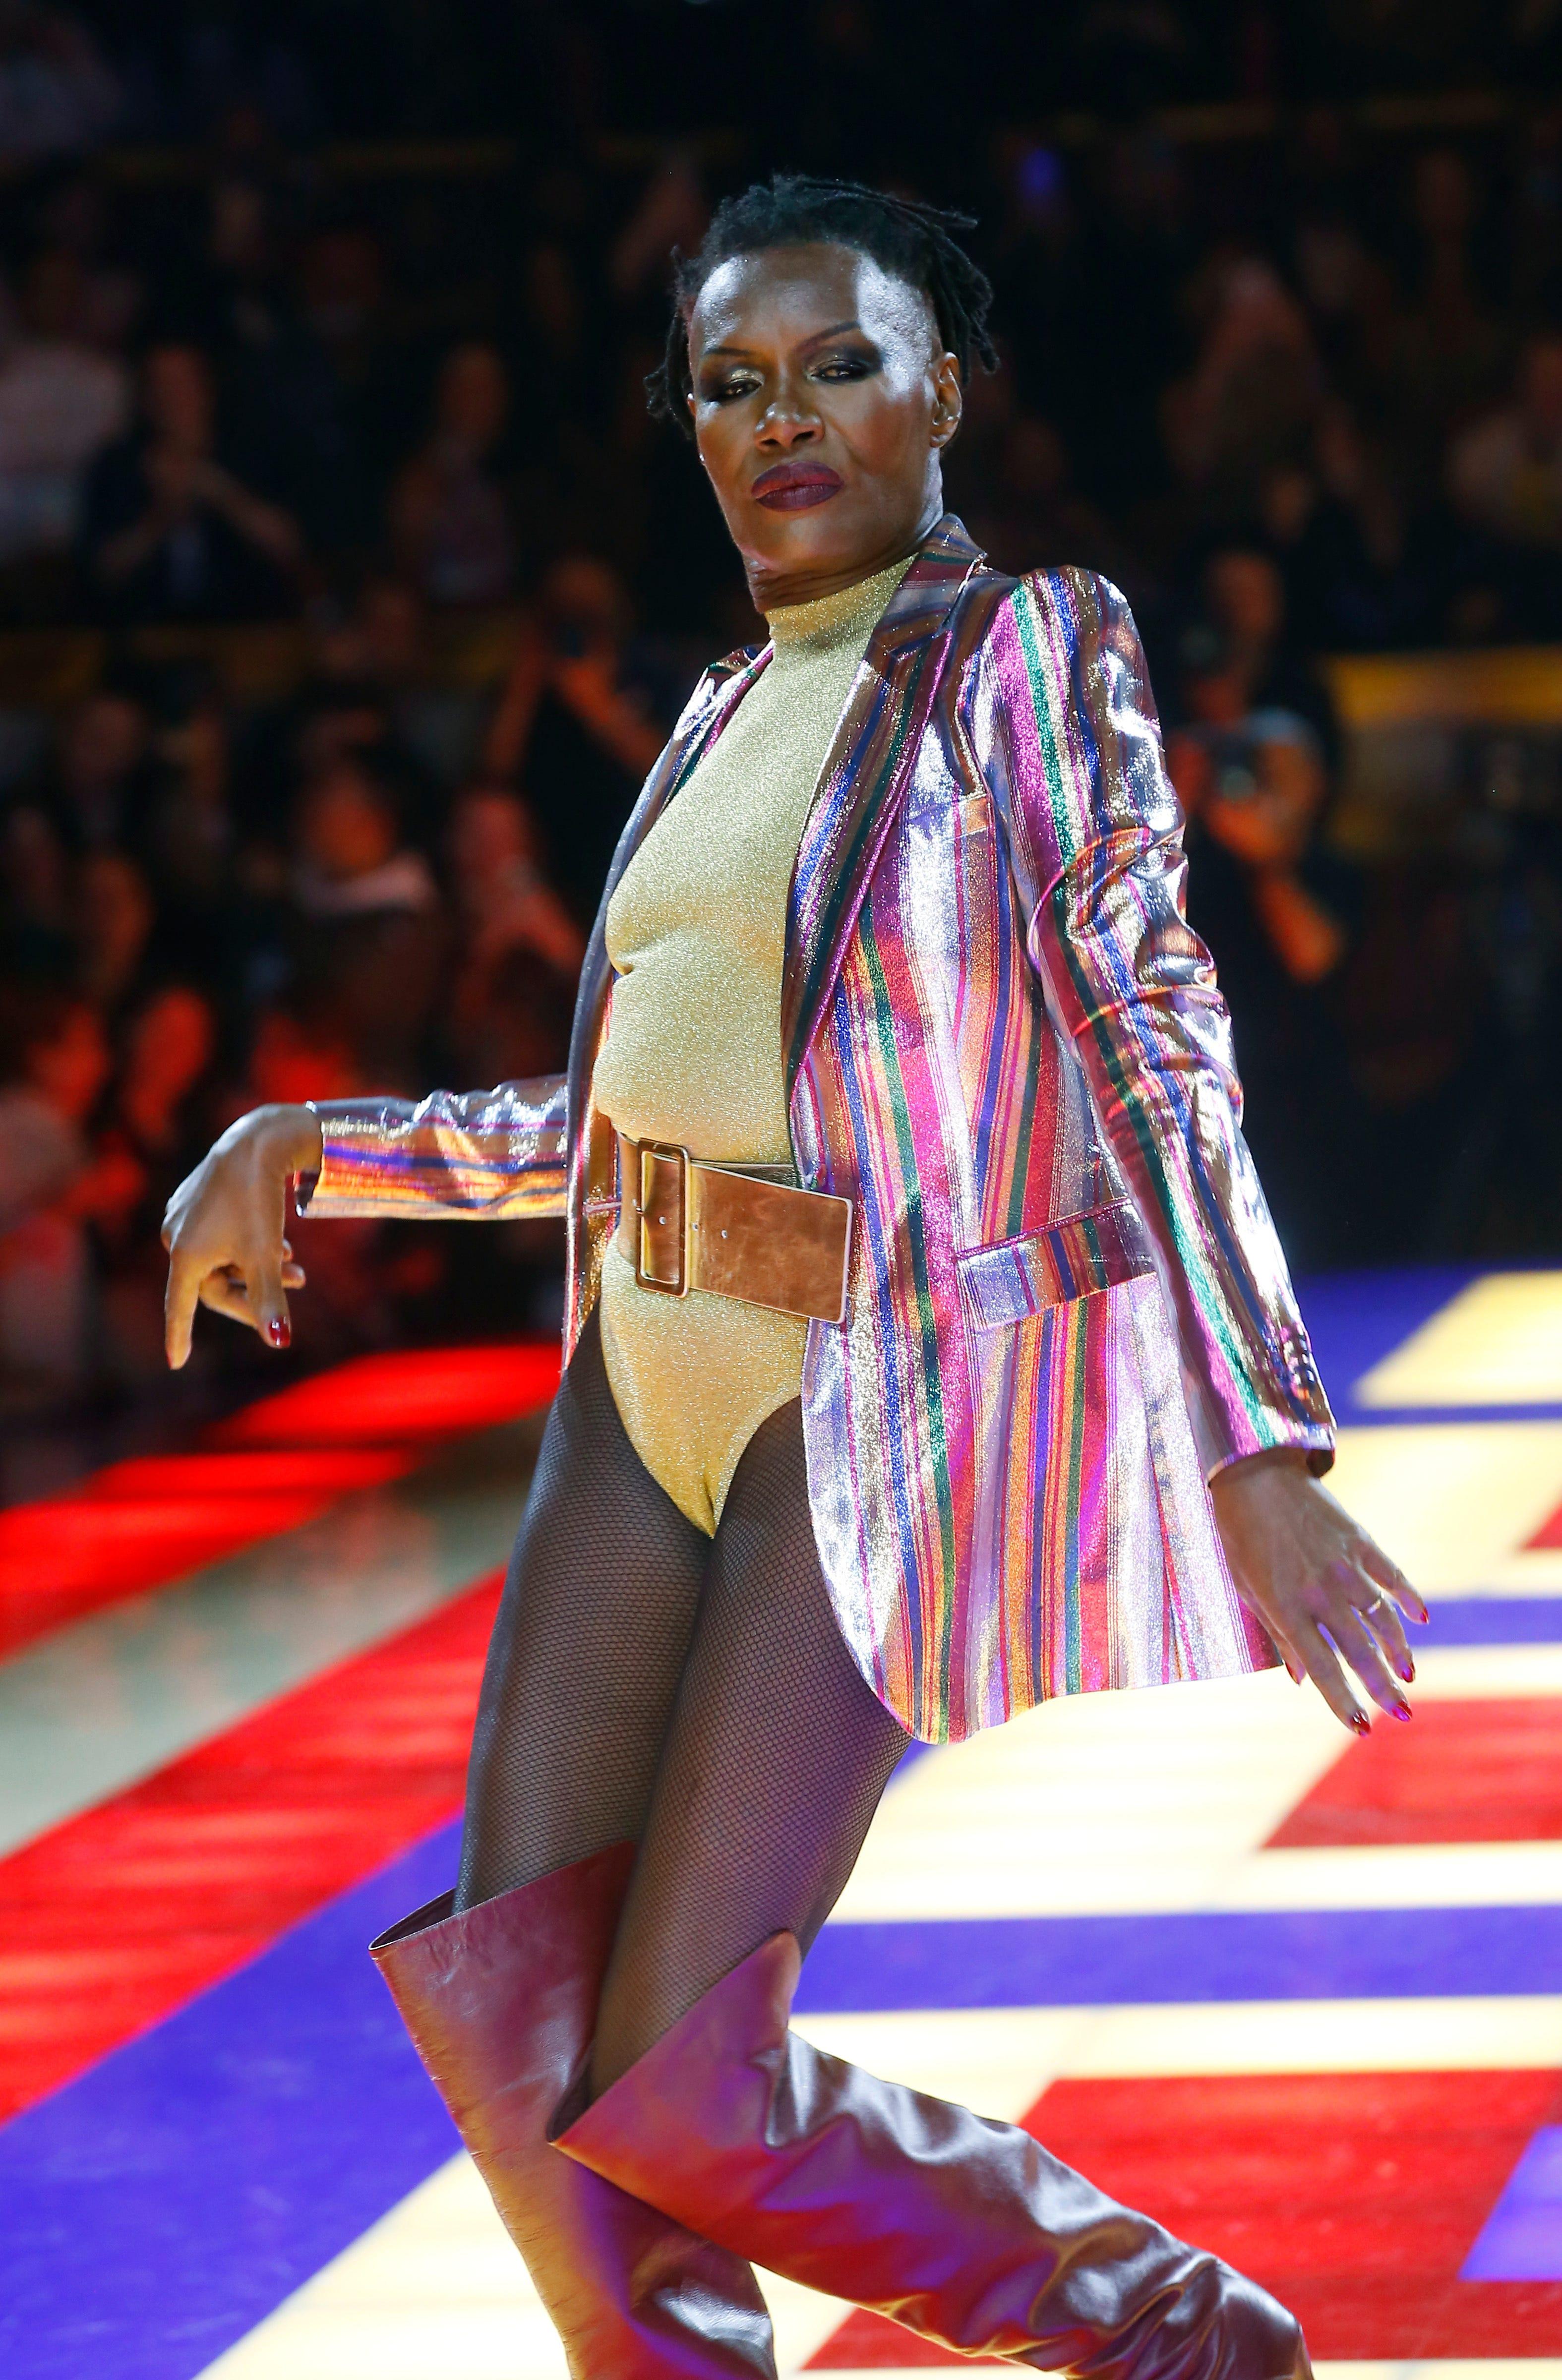 Grace Jones stuns at Zendaya and Tommy Hilfiger's diverse Paris Fashion Week show